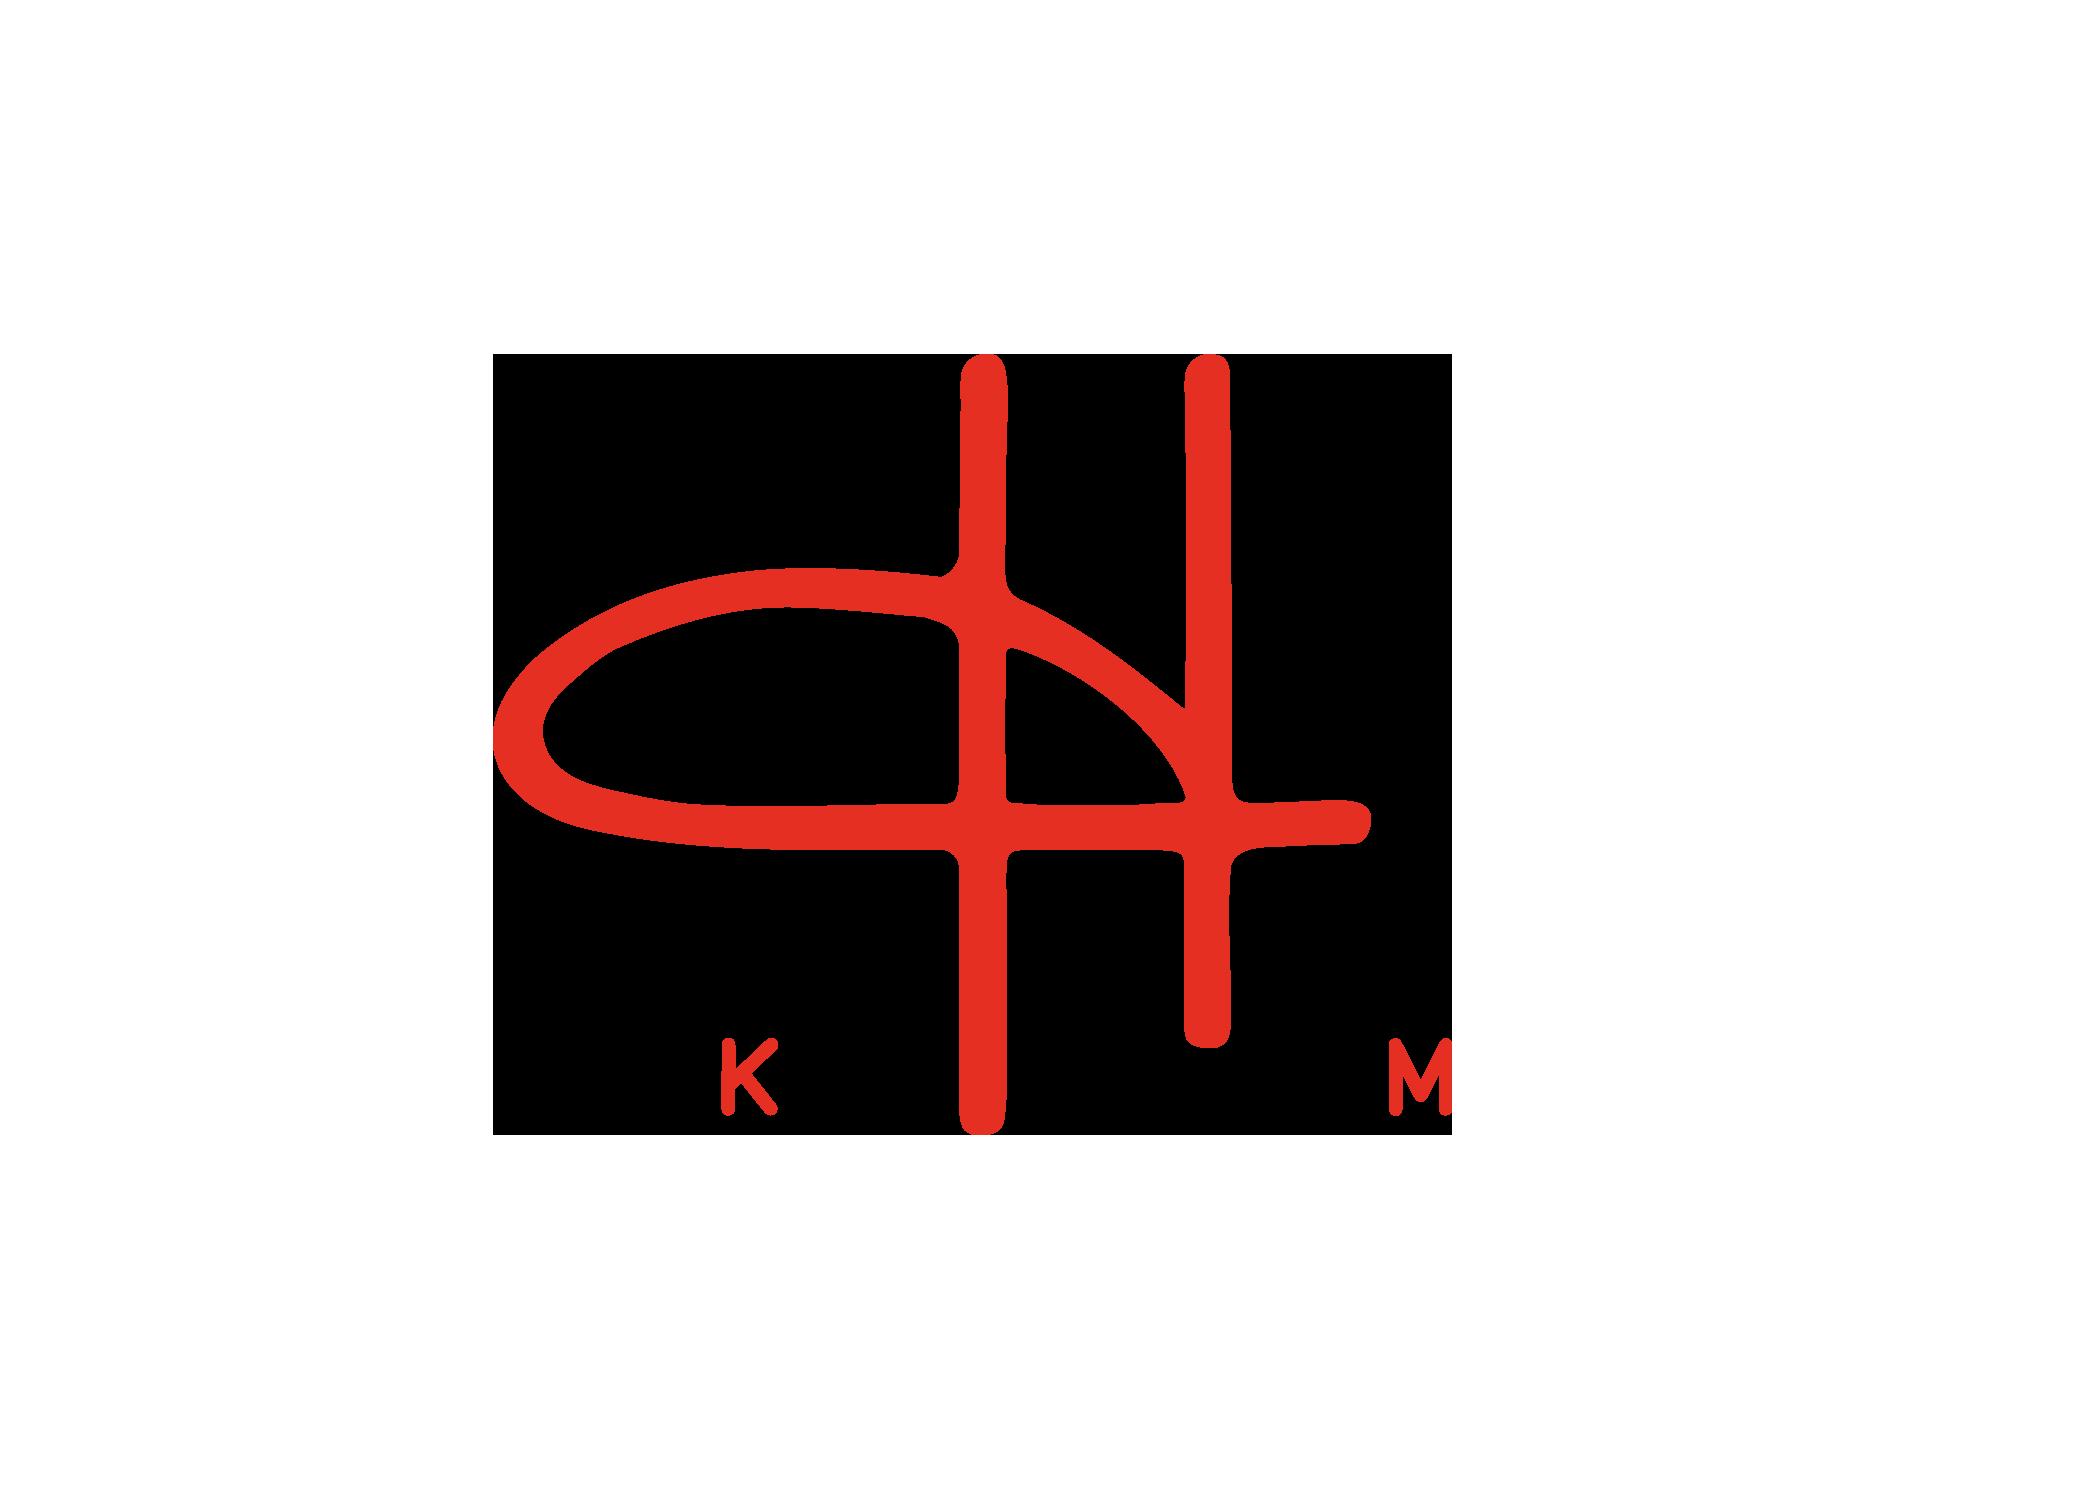 HKM_Mark.png